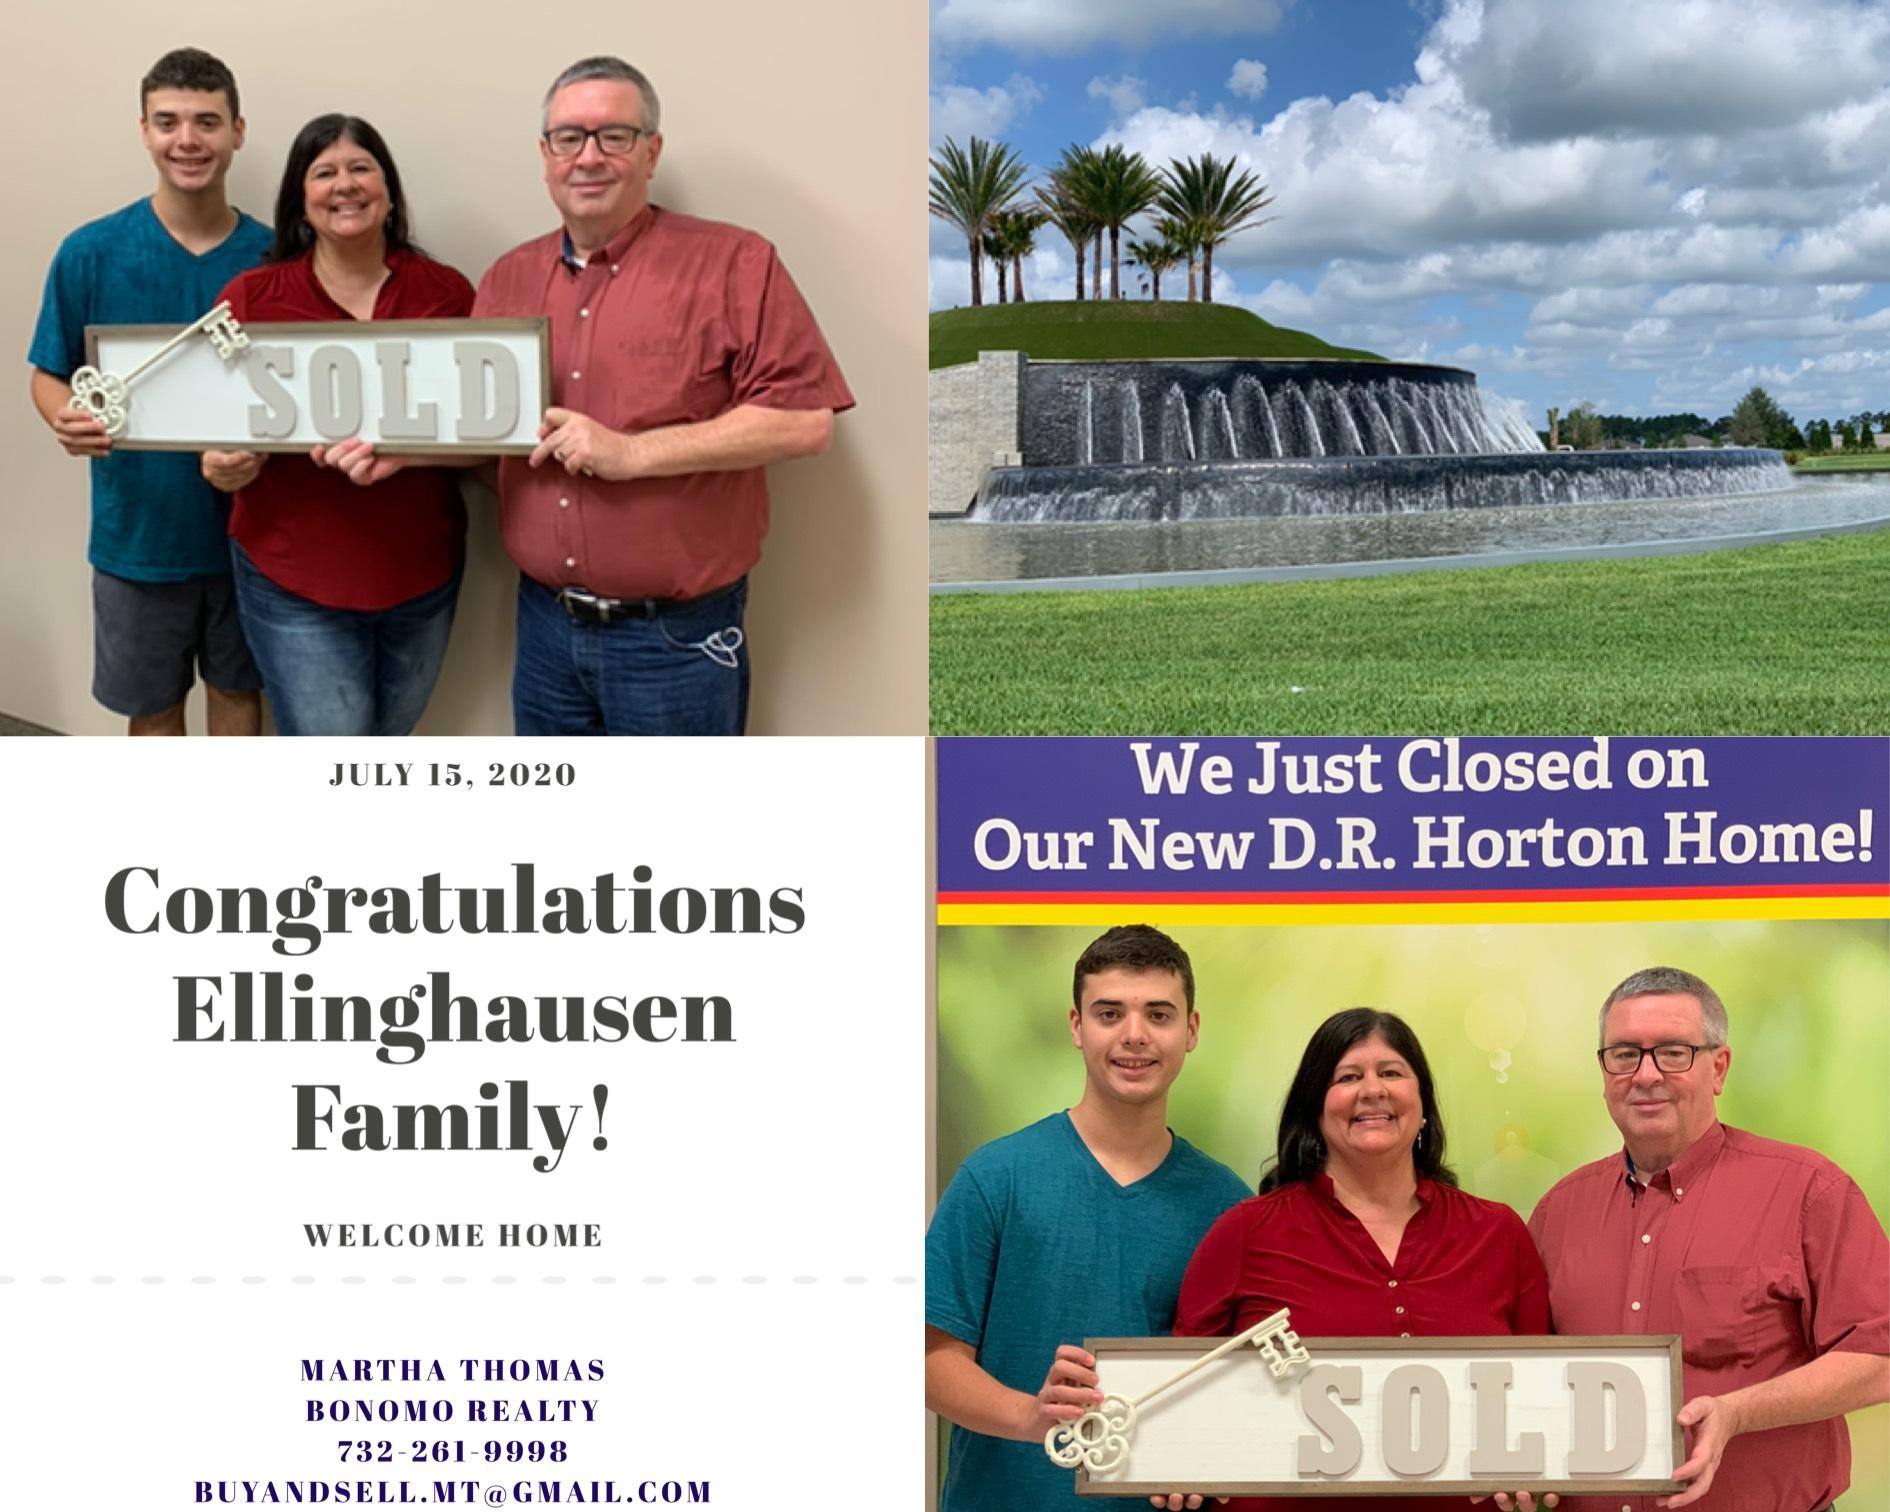 Congratulations Ellinghausen Family